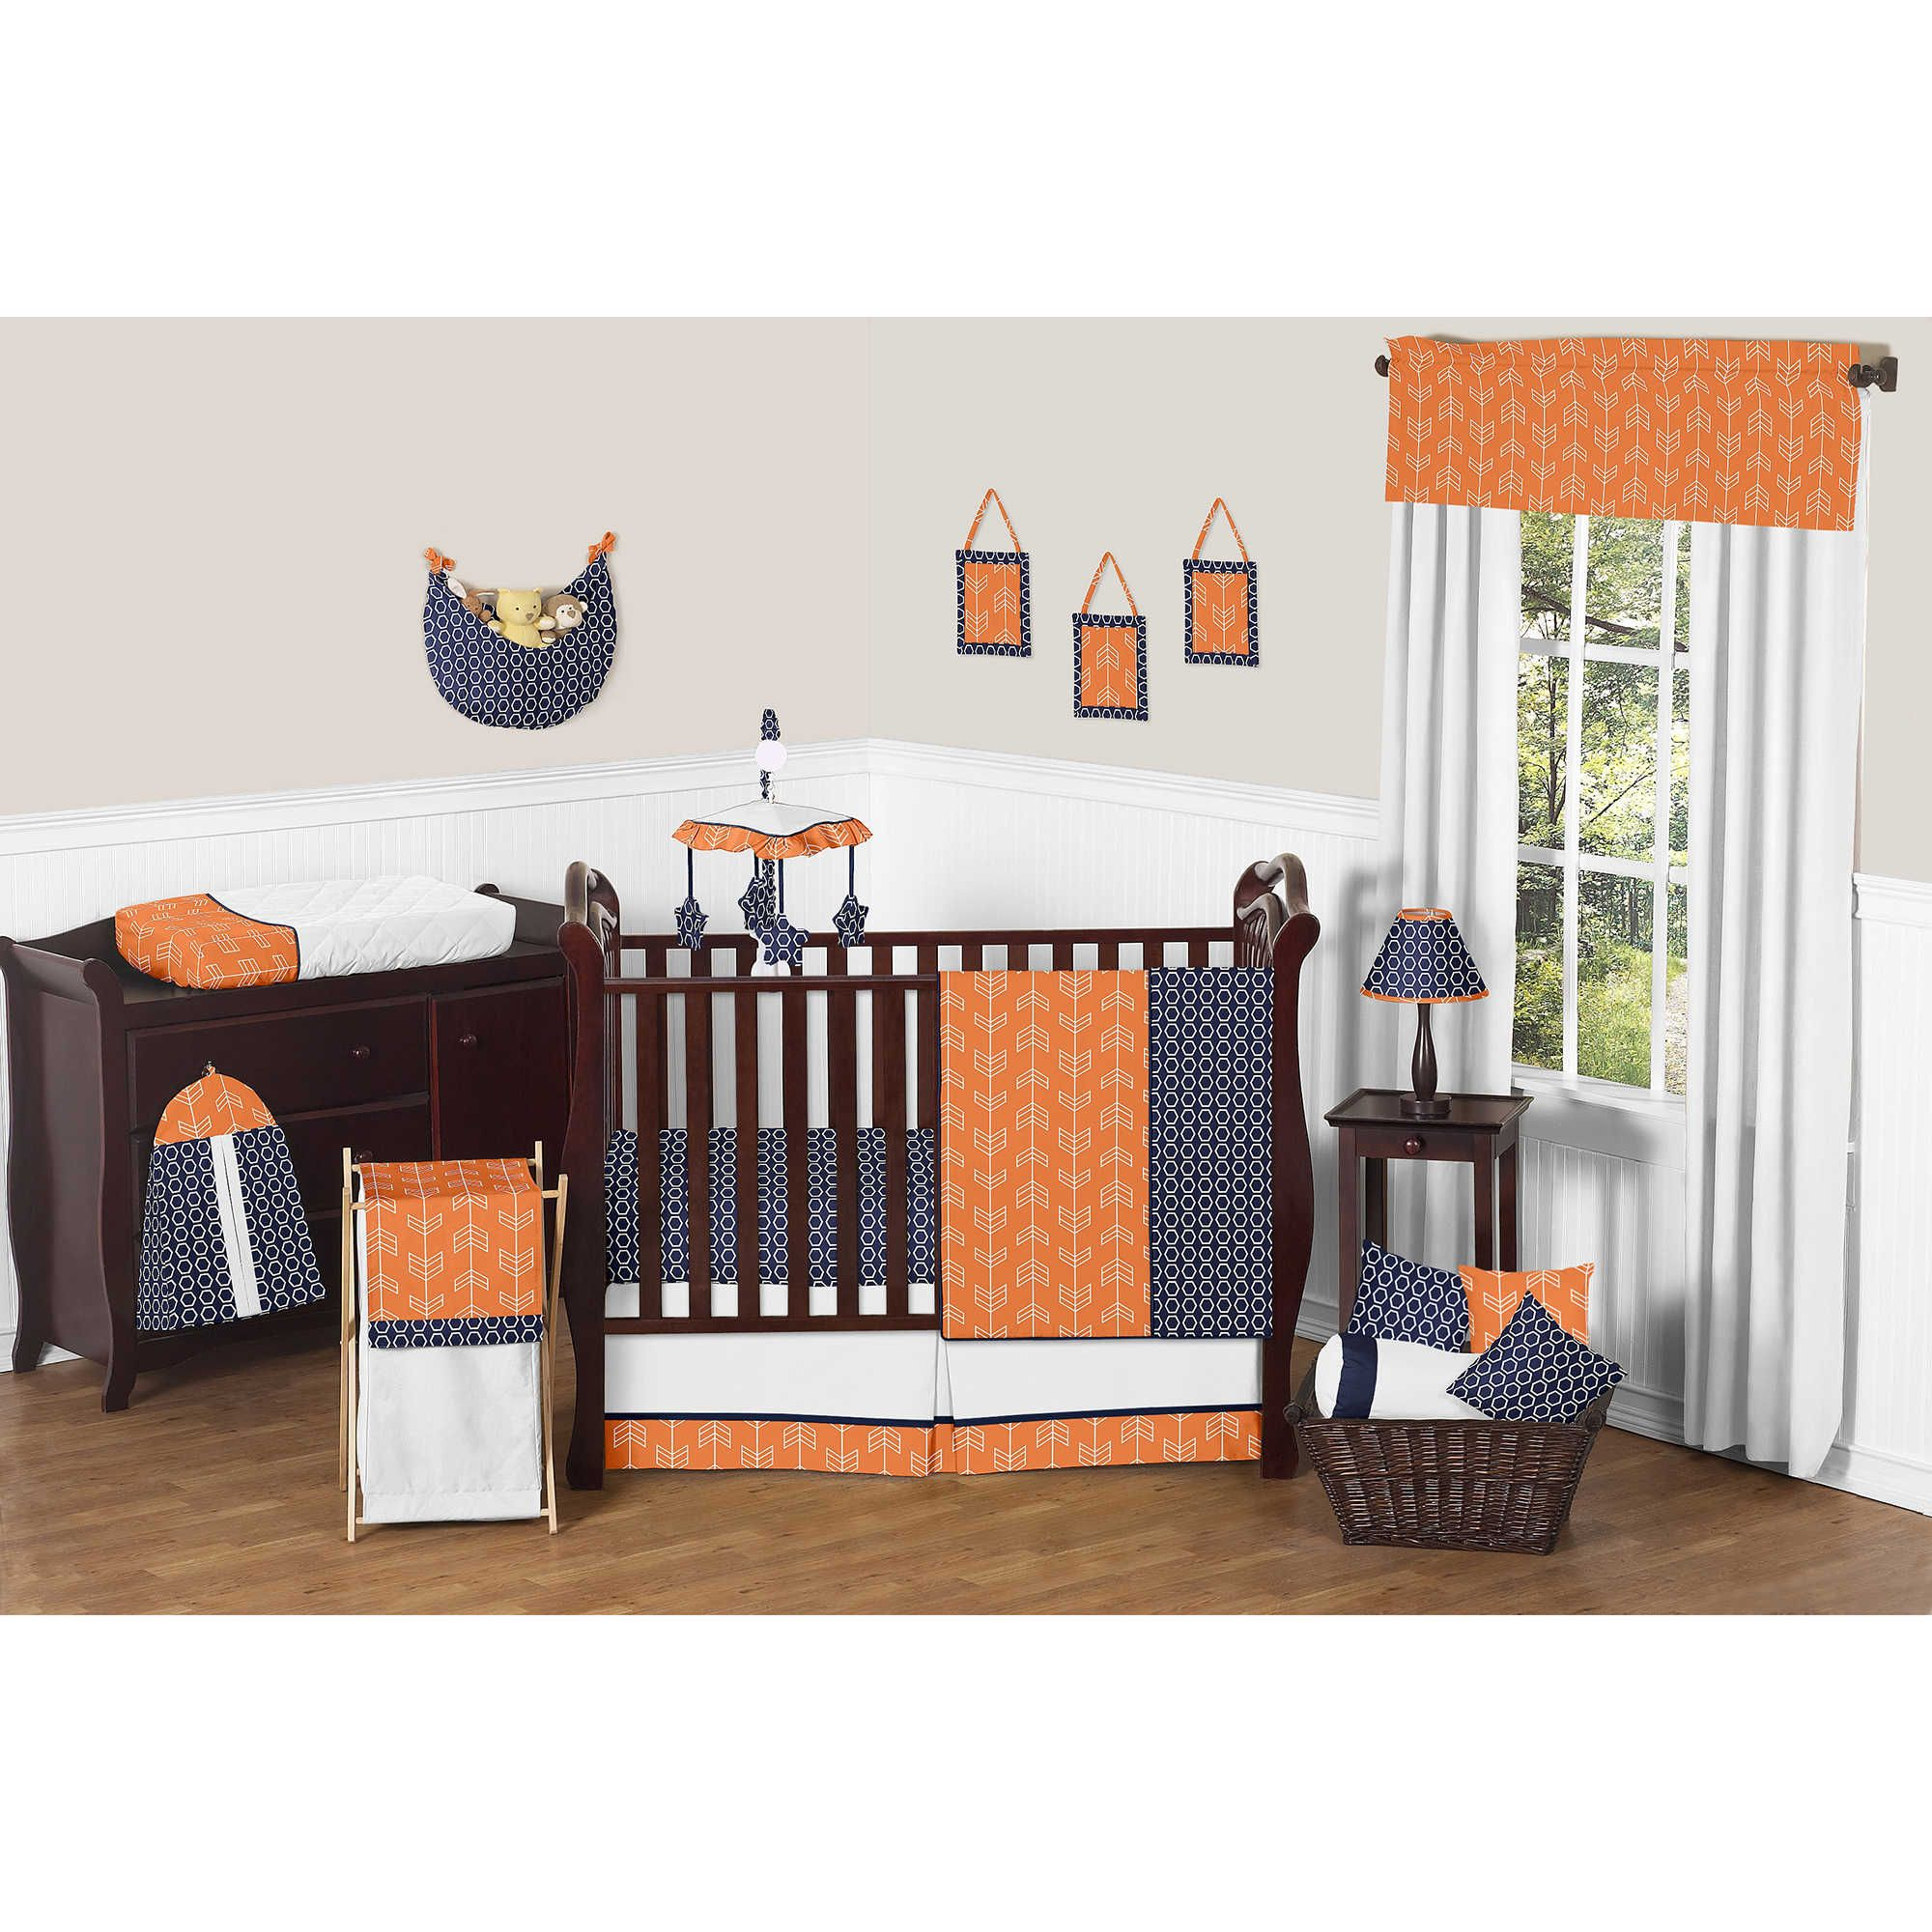 url s net crib western cribs boy sweet shld baby getimage jojo west cowboy site wild set bedding horse designs